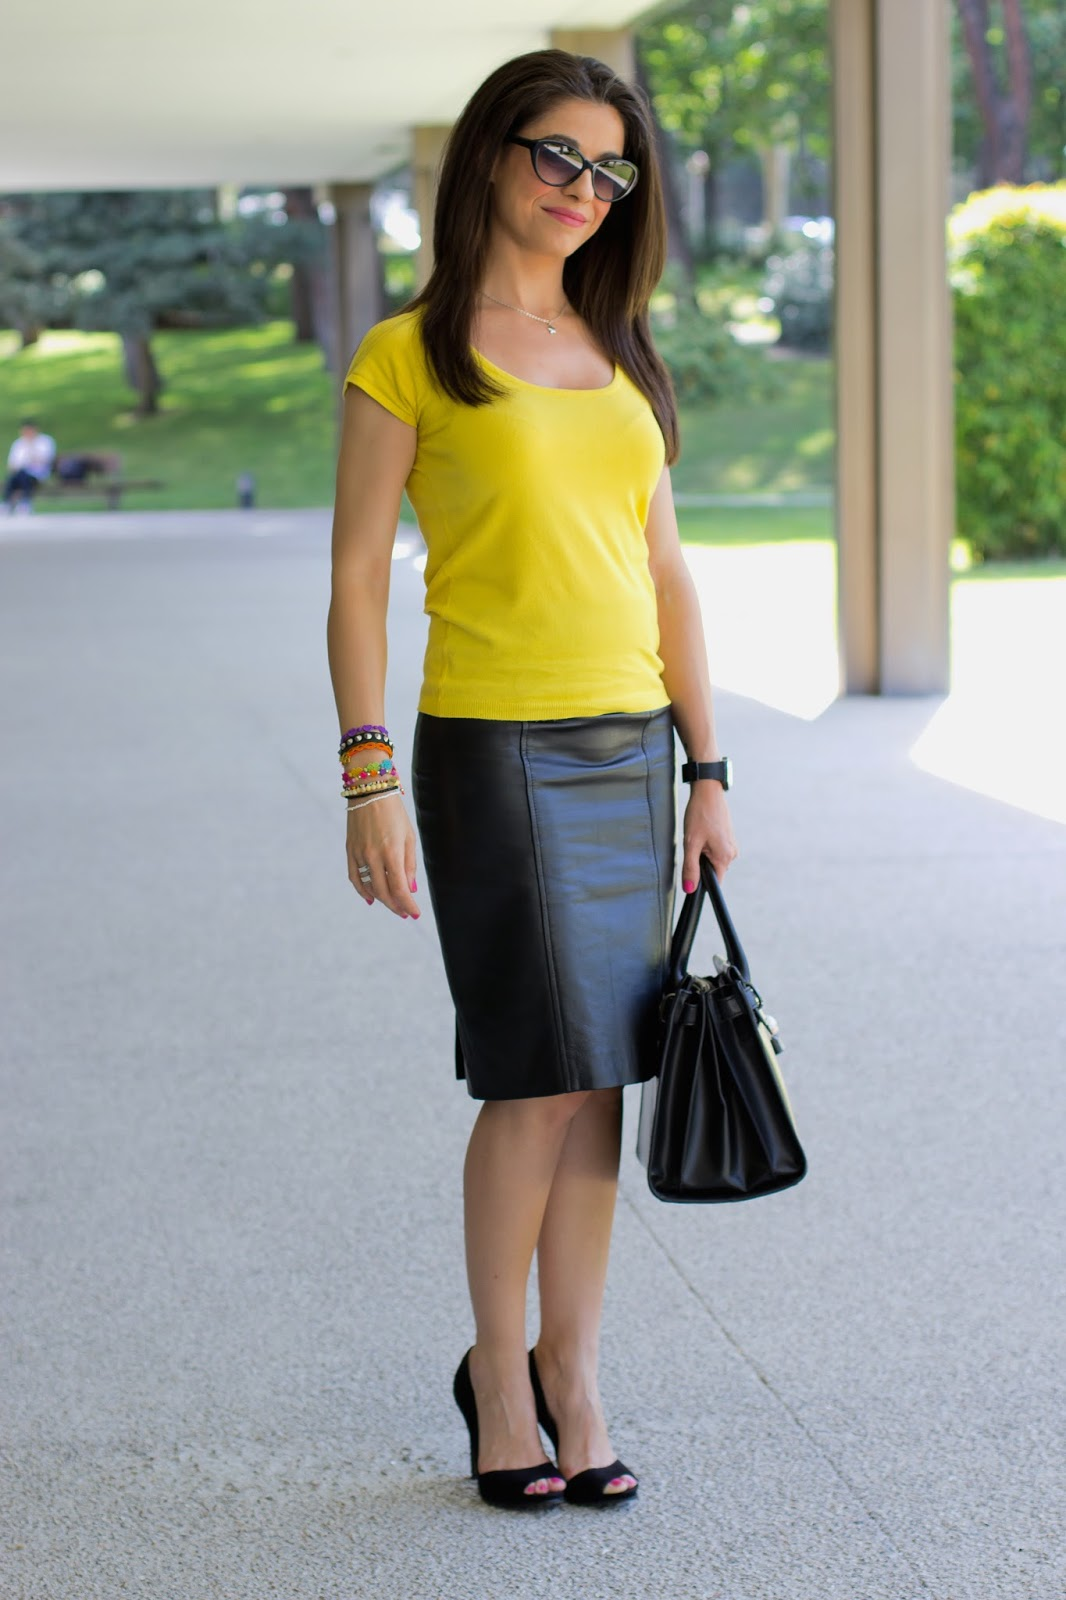 La caprichossa mi diario runner blog de moda belleza for Garderobe 33 style blog